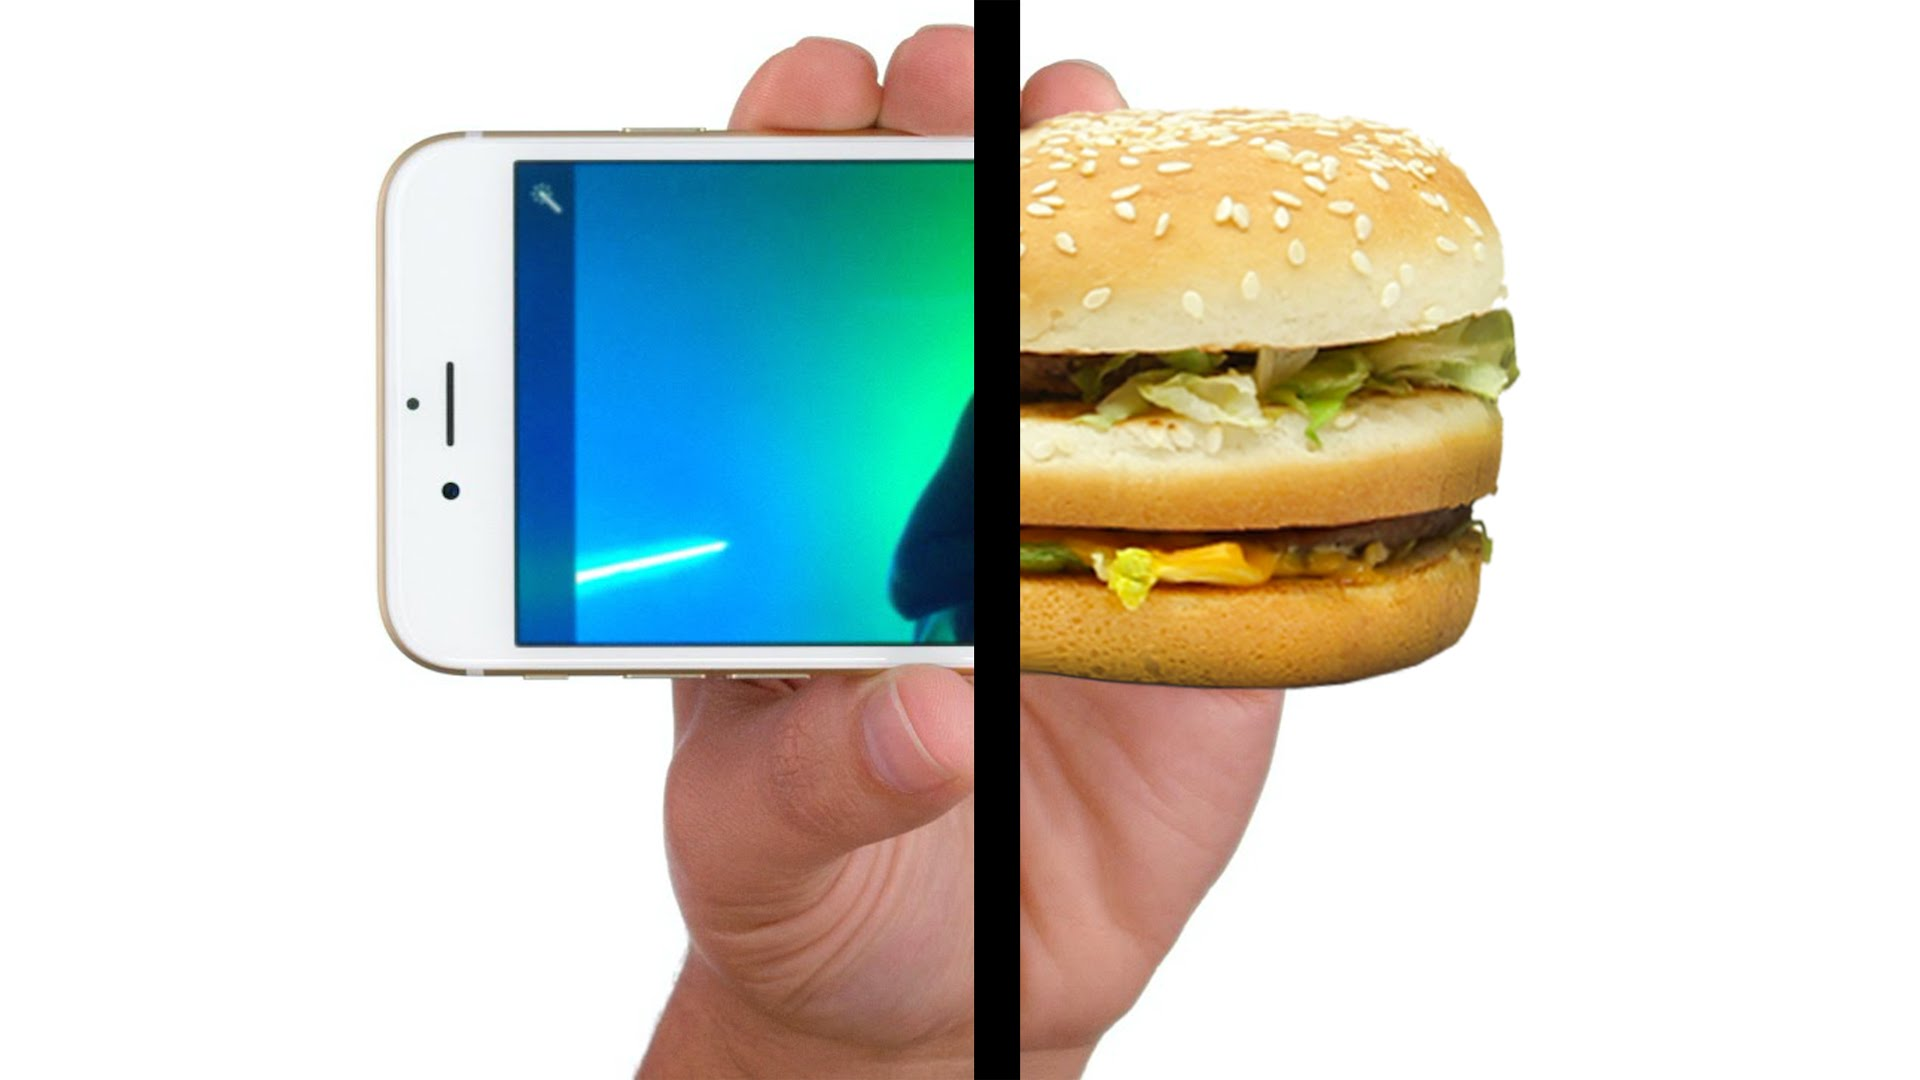 「如果麥當勞廣告做得跟蘋果廣告一樣...」- If McDonald's Advertised Like Apple